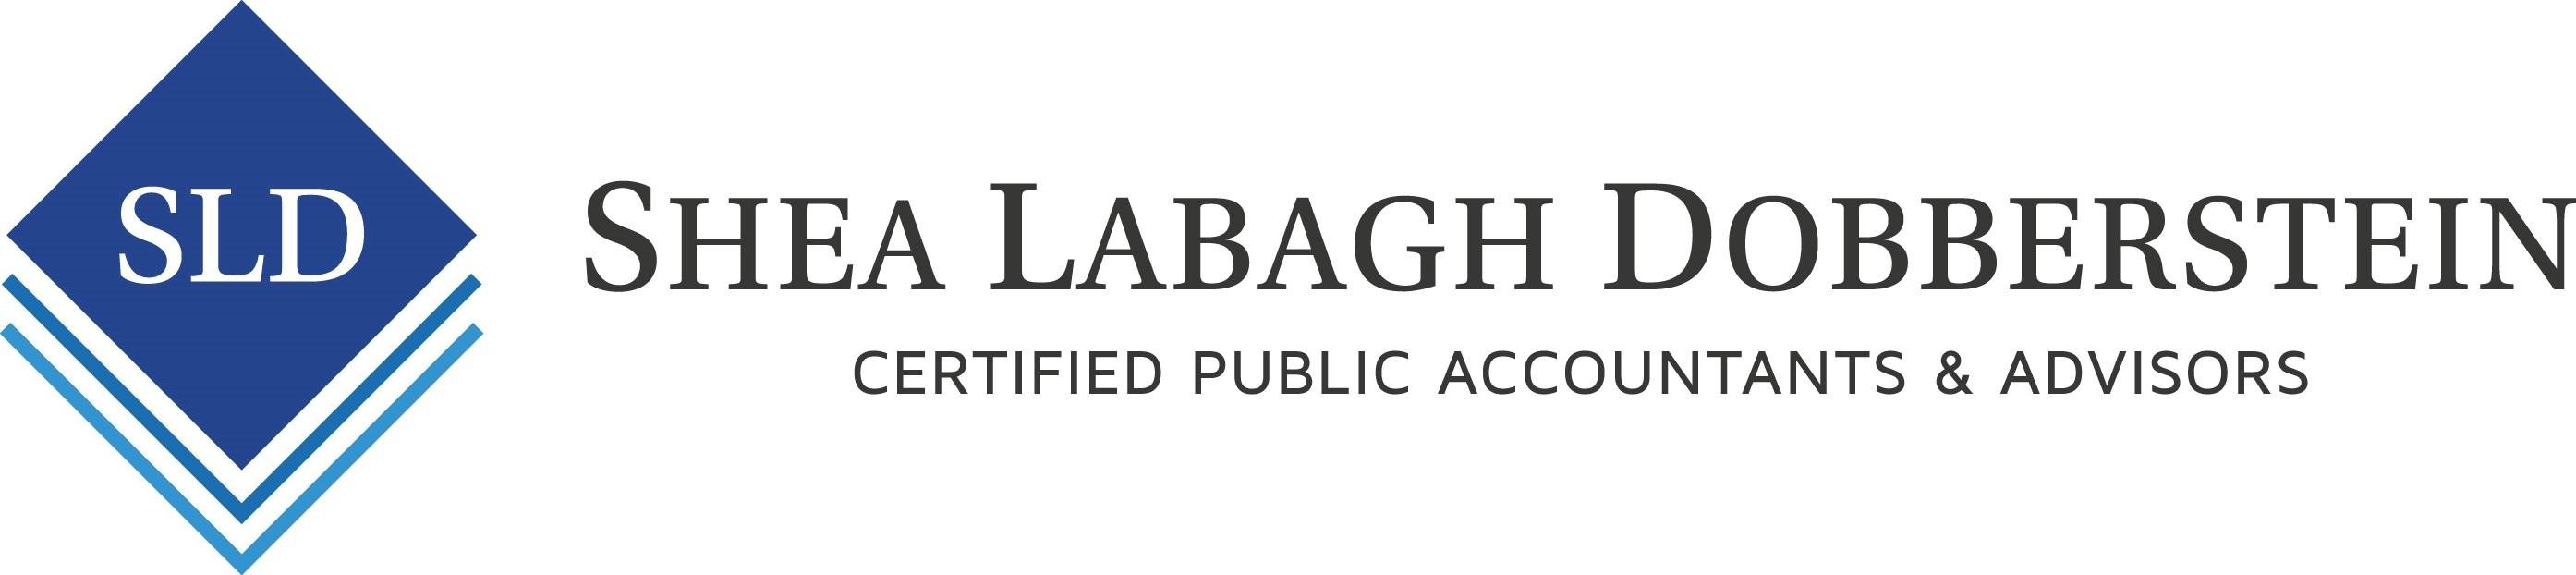 Shea Labagh Dobberstein logo